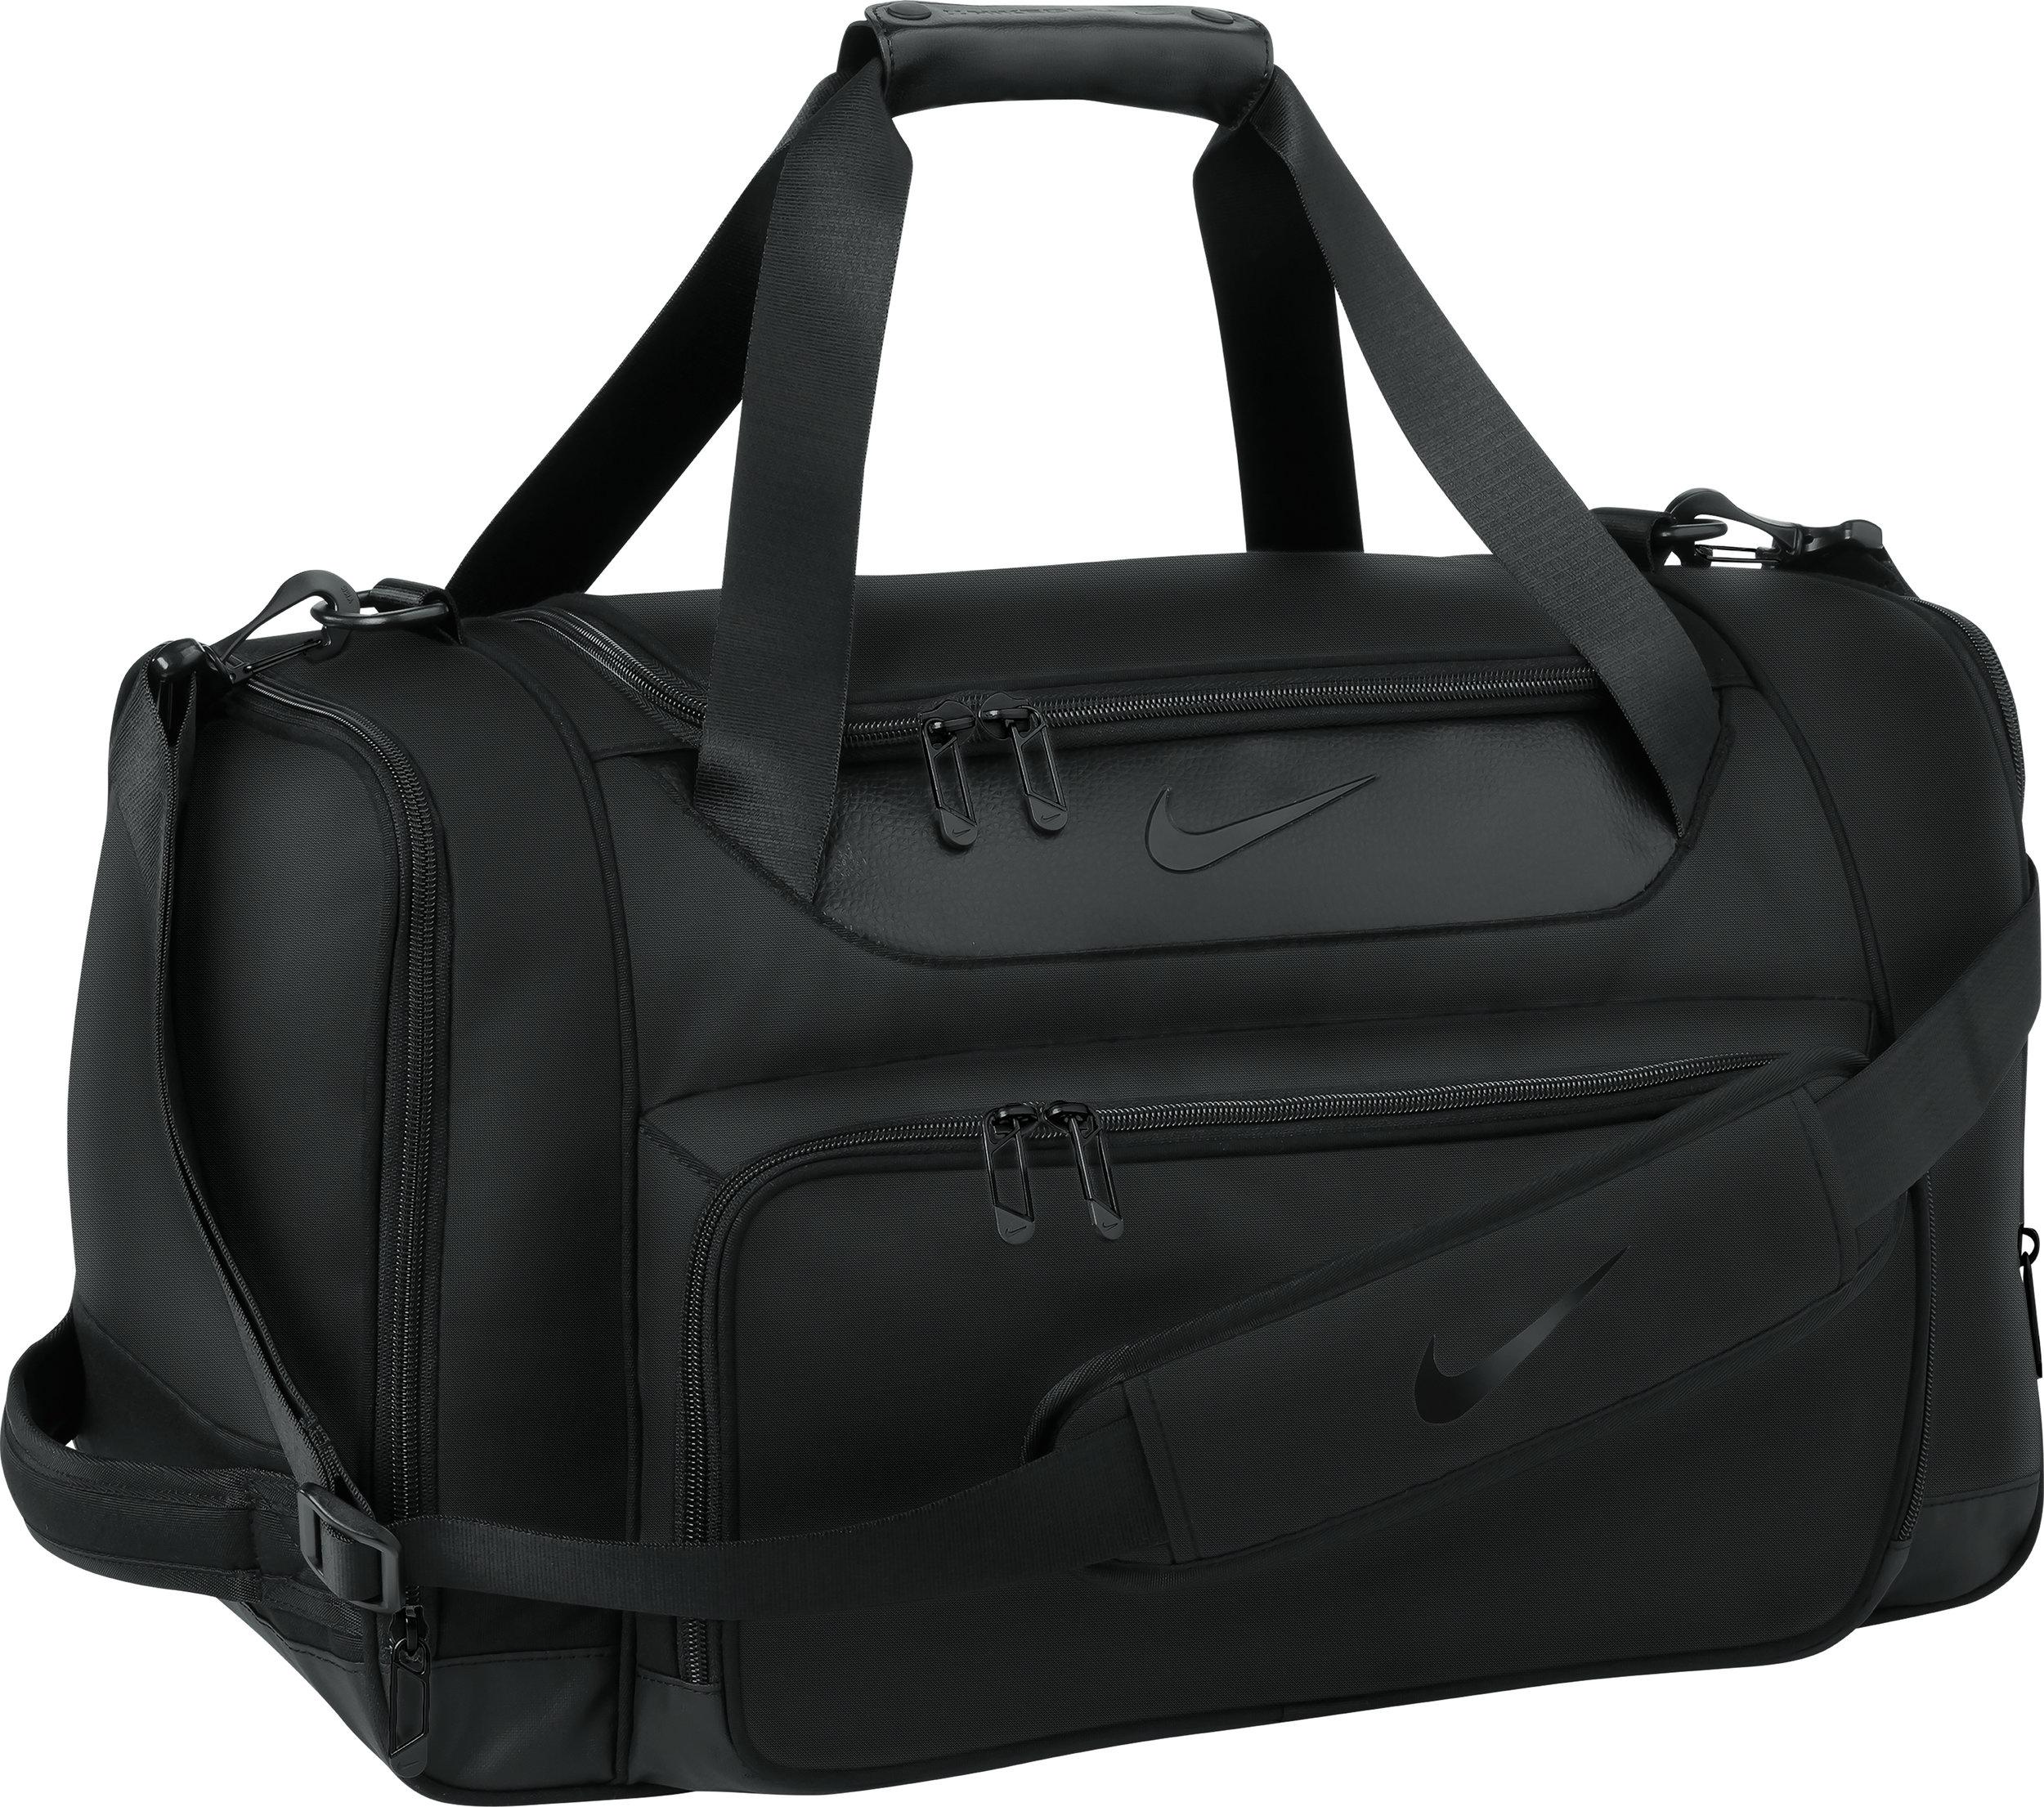 Duffle Bag.jpg